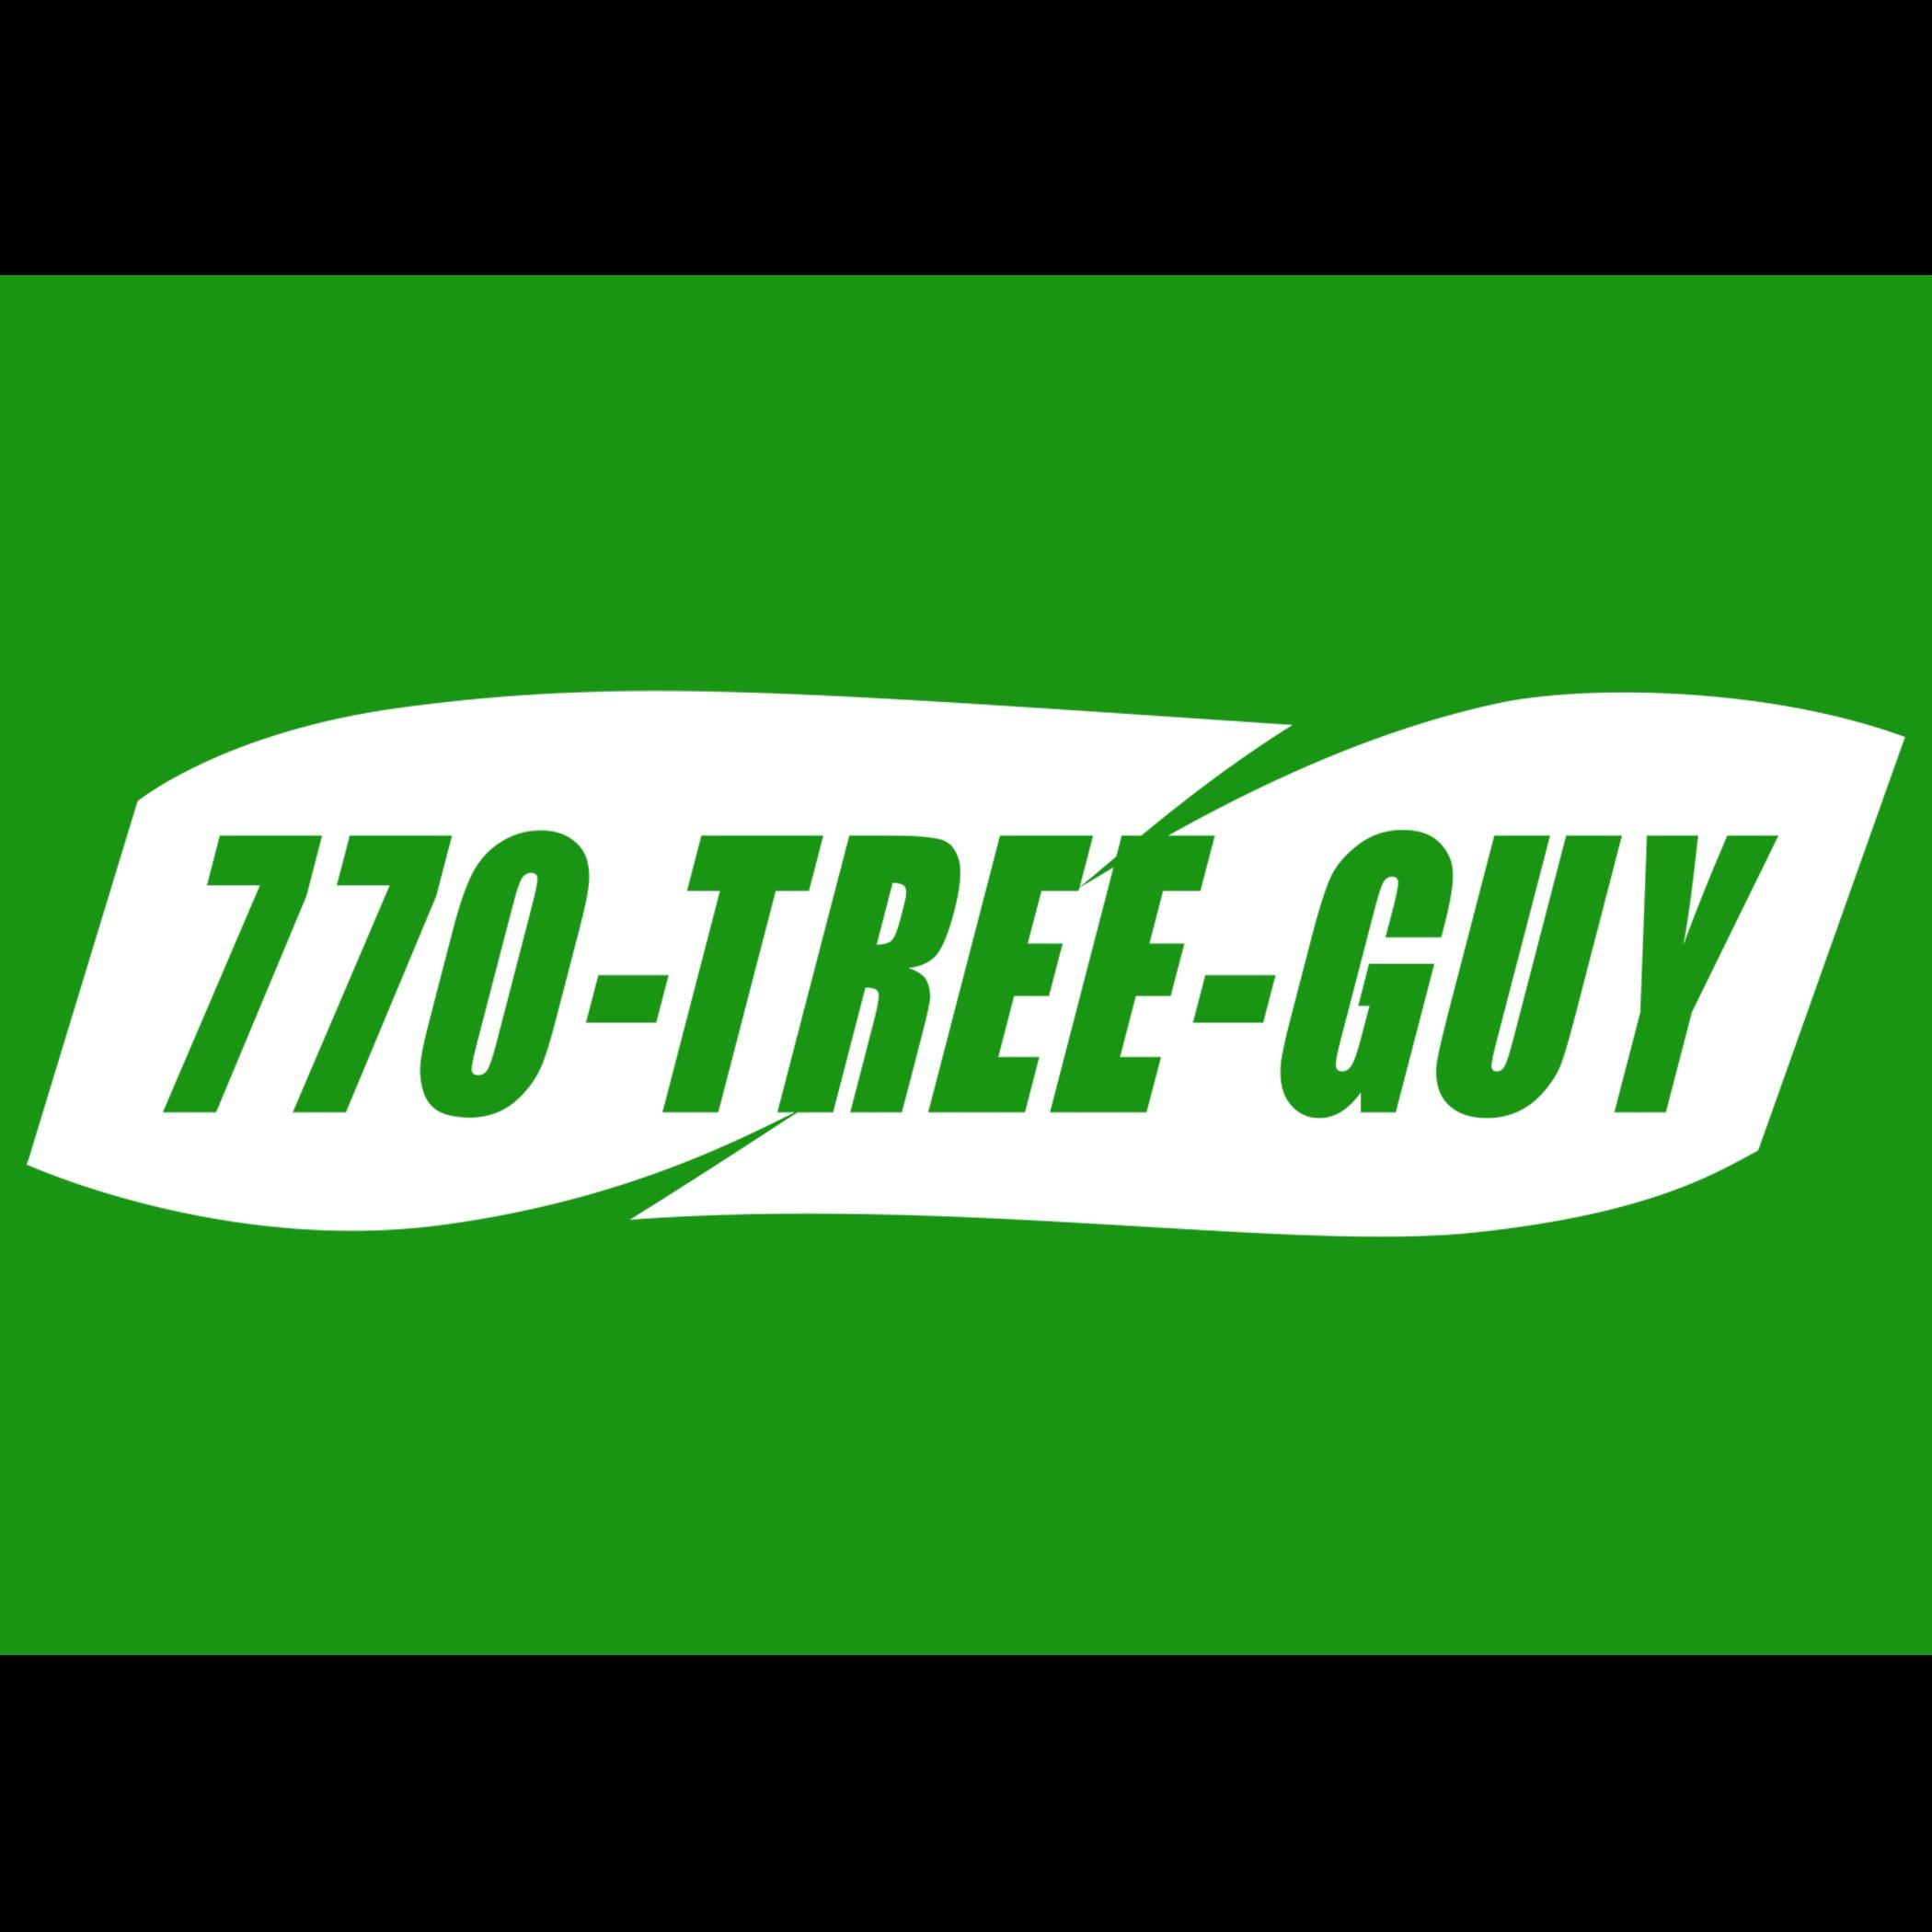 770-Tree-Guy